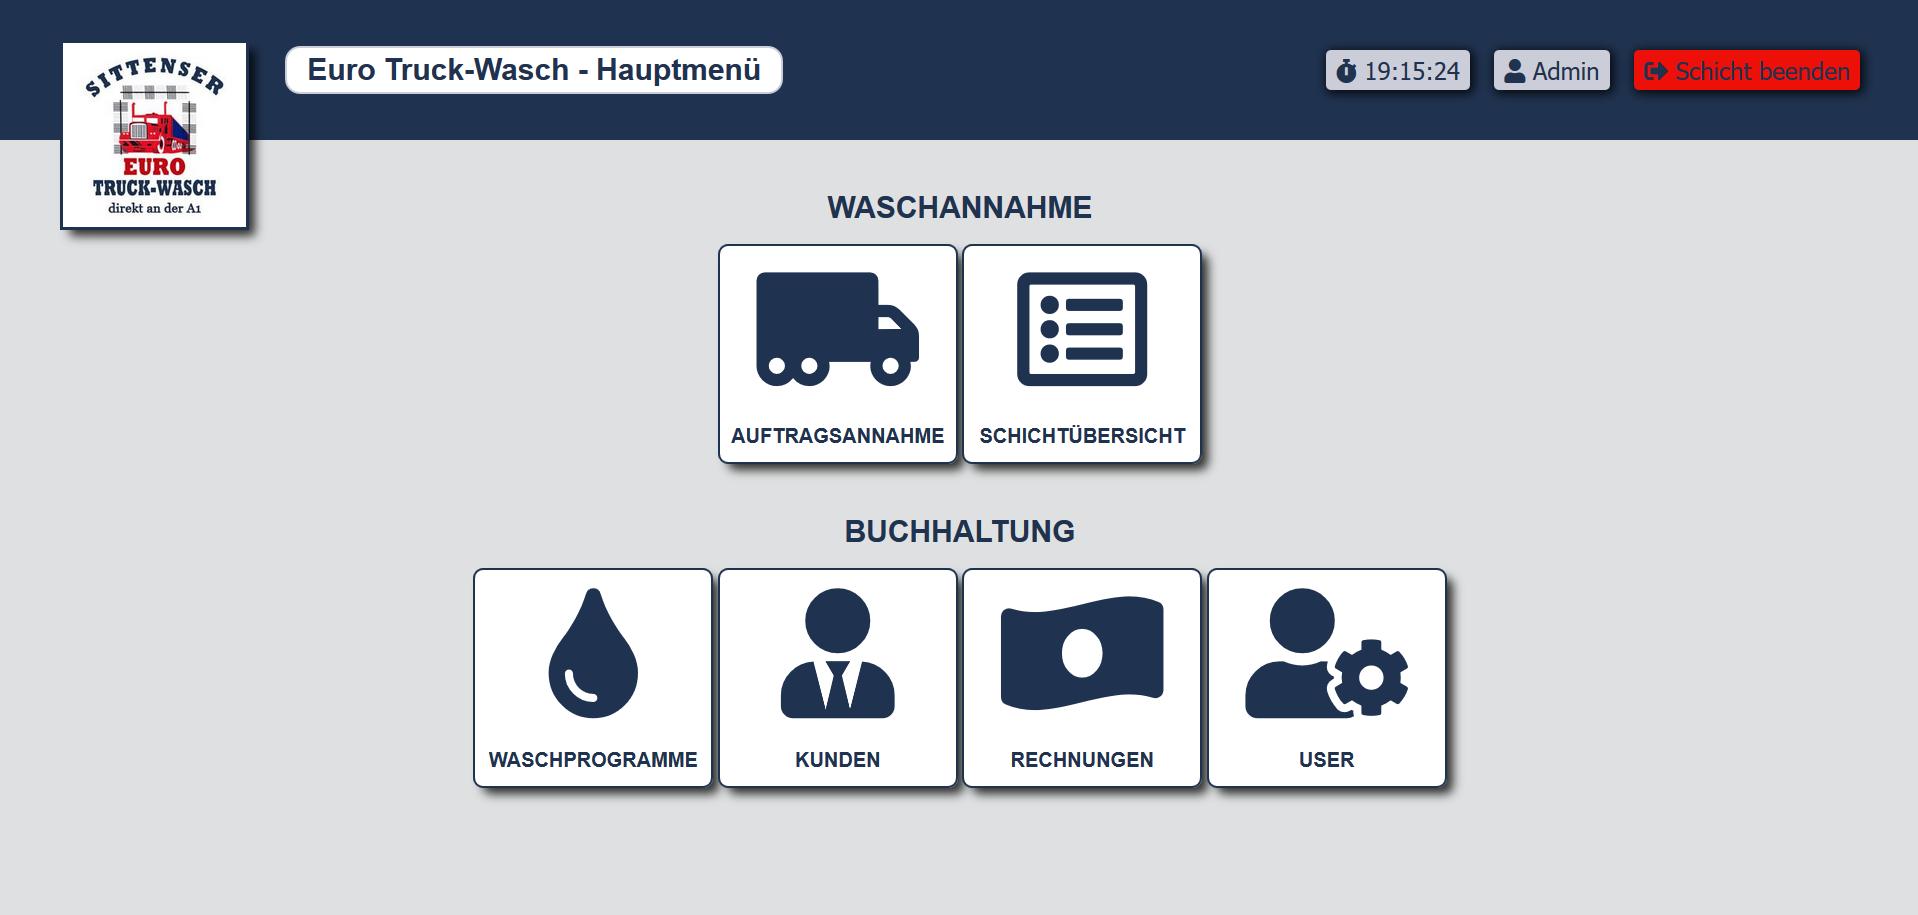 Eurotruckwasch-Waschannahme-02